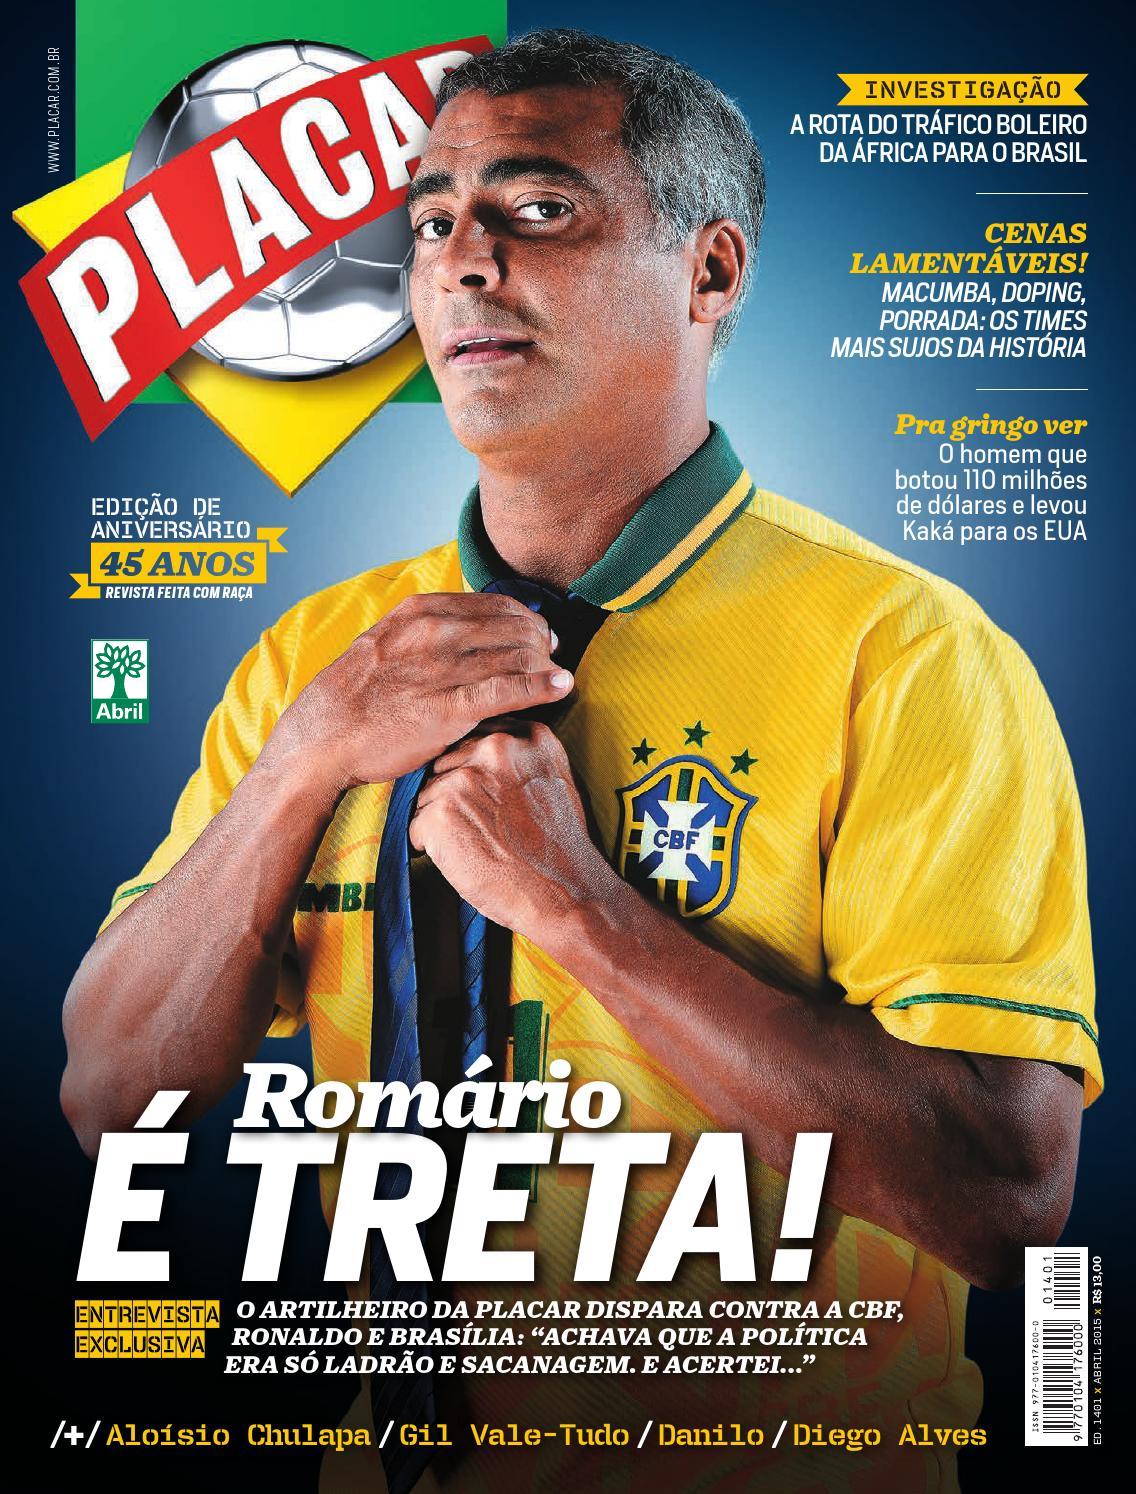 Revista Placar – Editora Abril by Revista Placar - issuu 8cecc6639f9f8